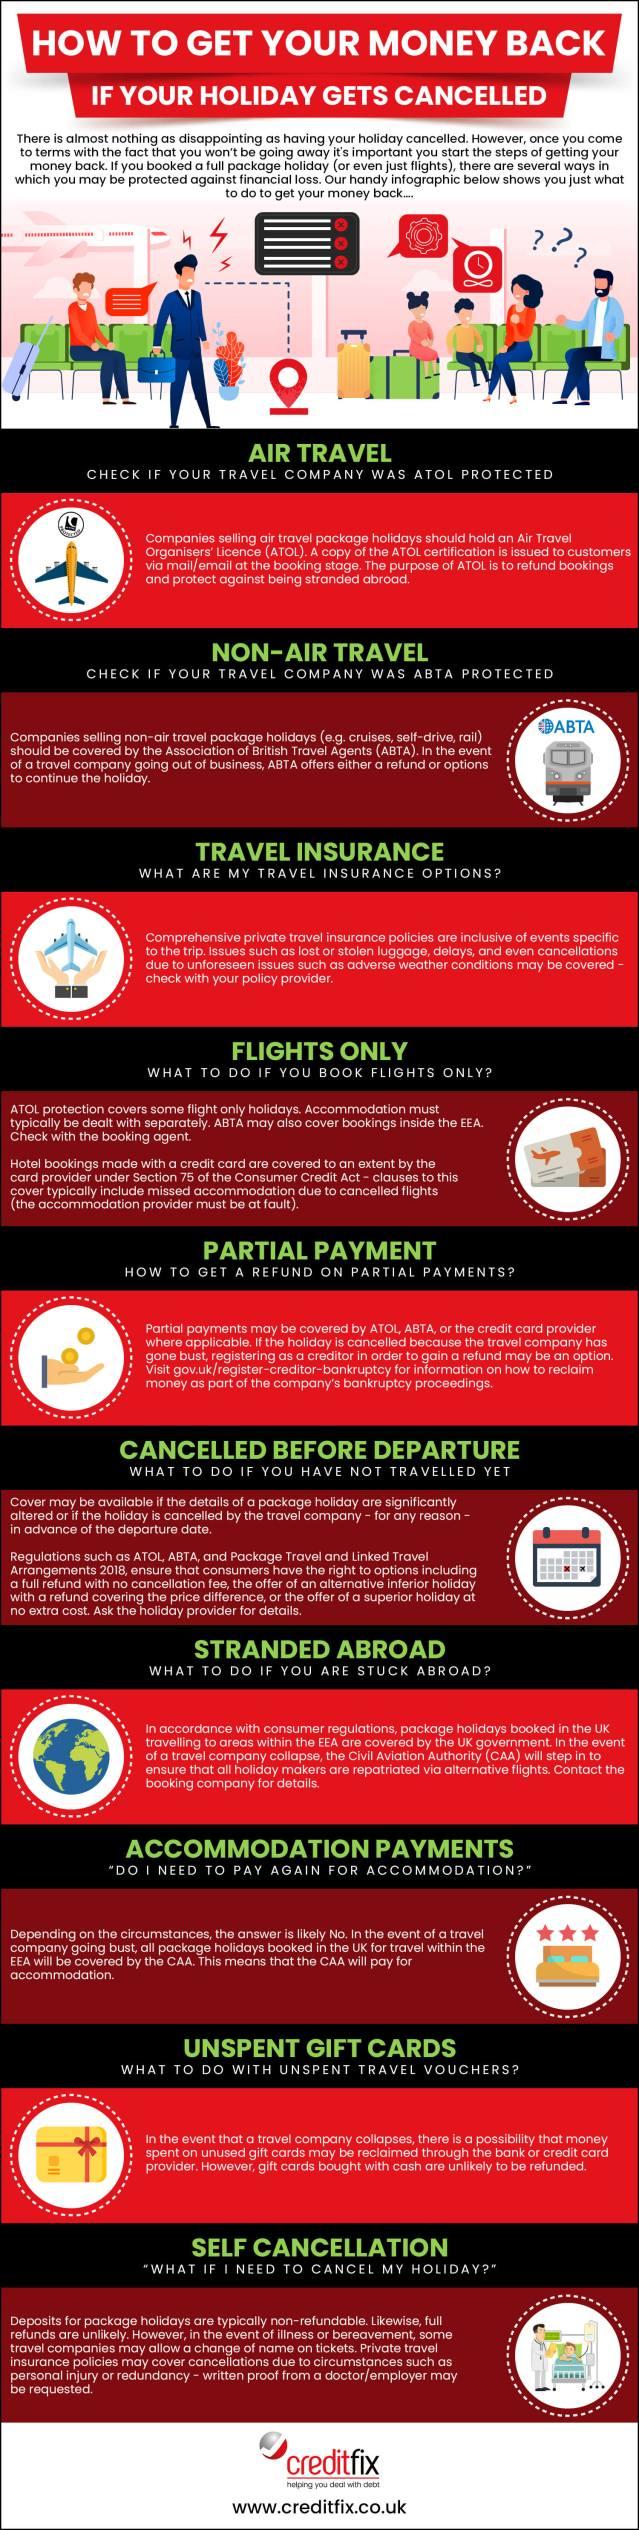 creditfix holiday cancellation infographic 1